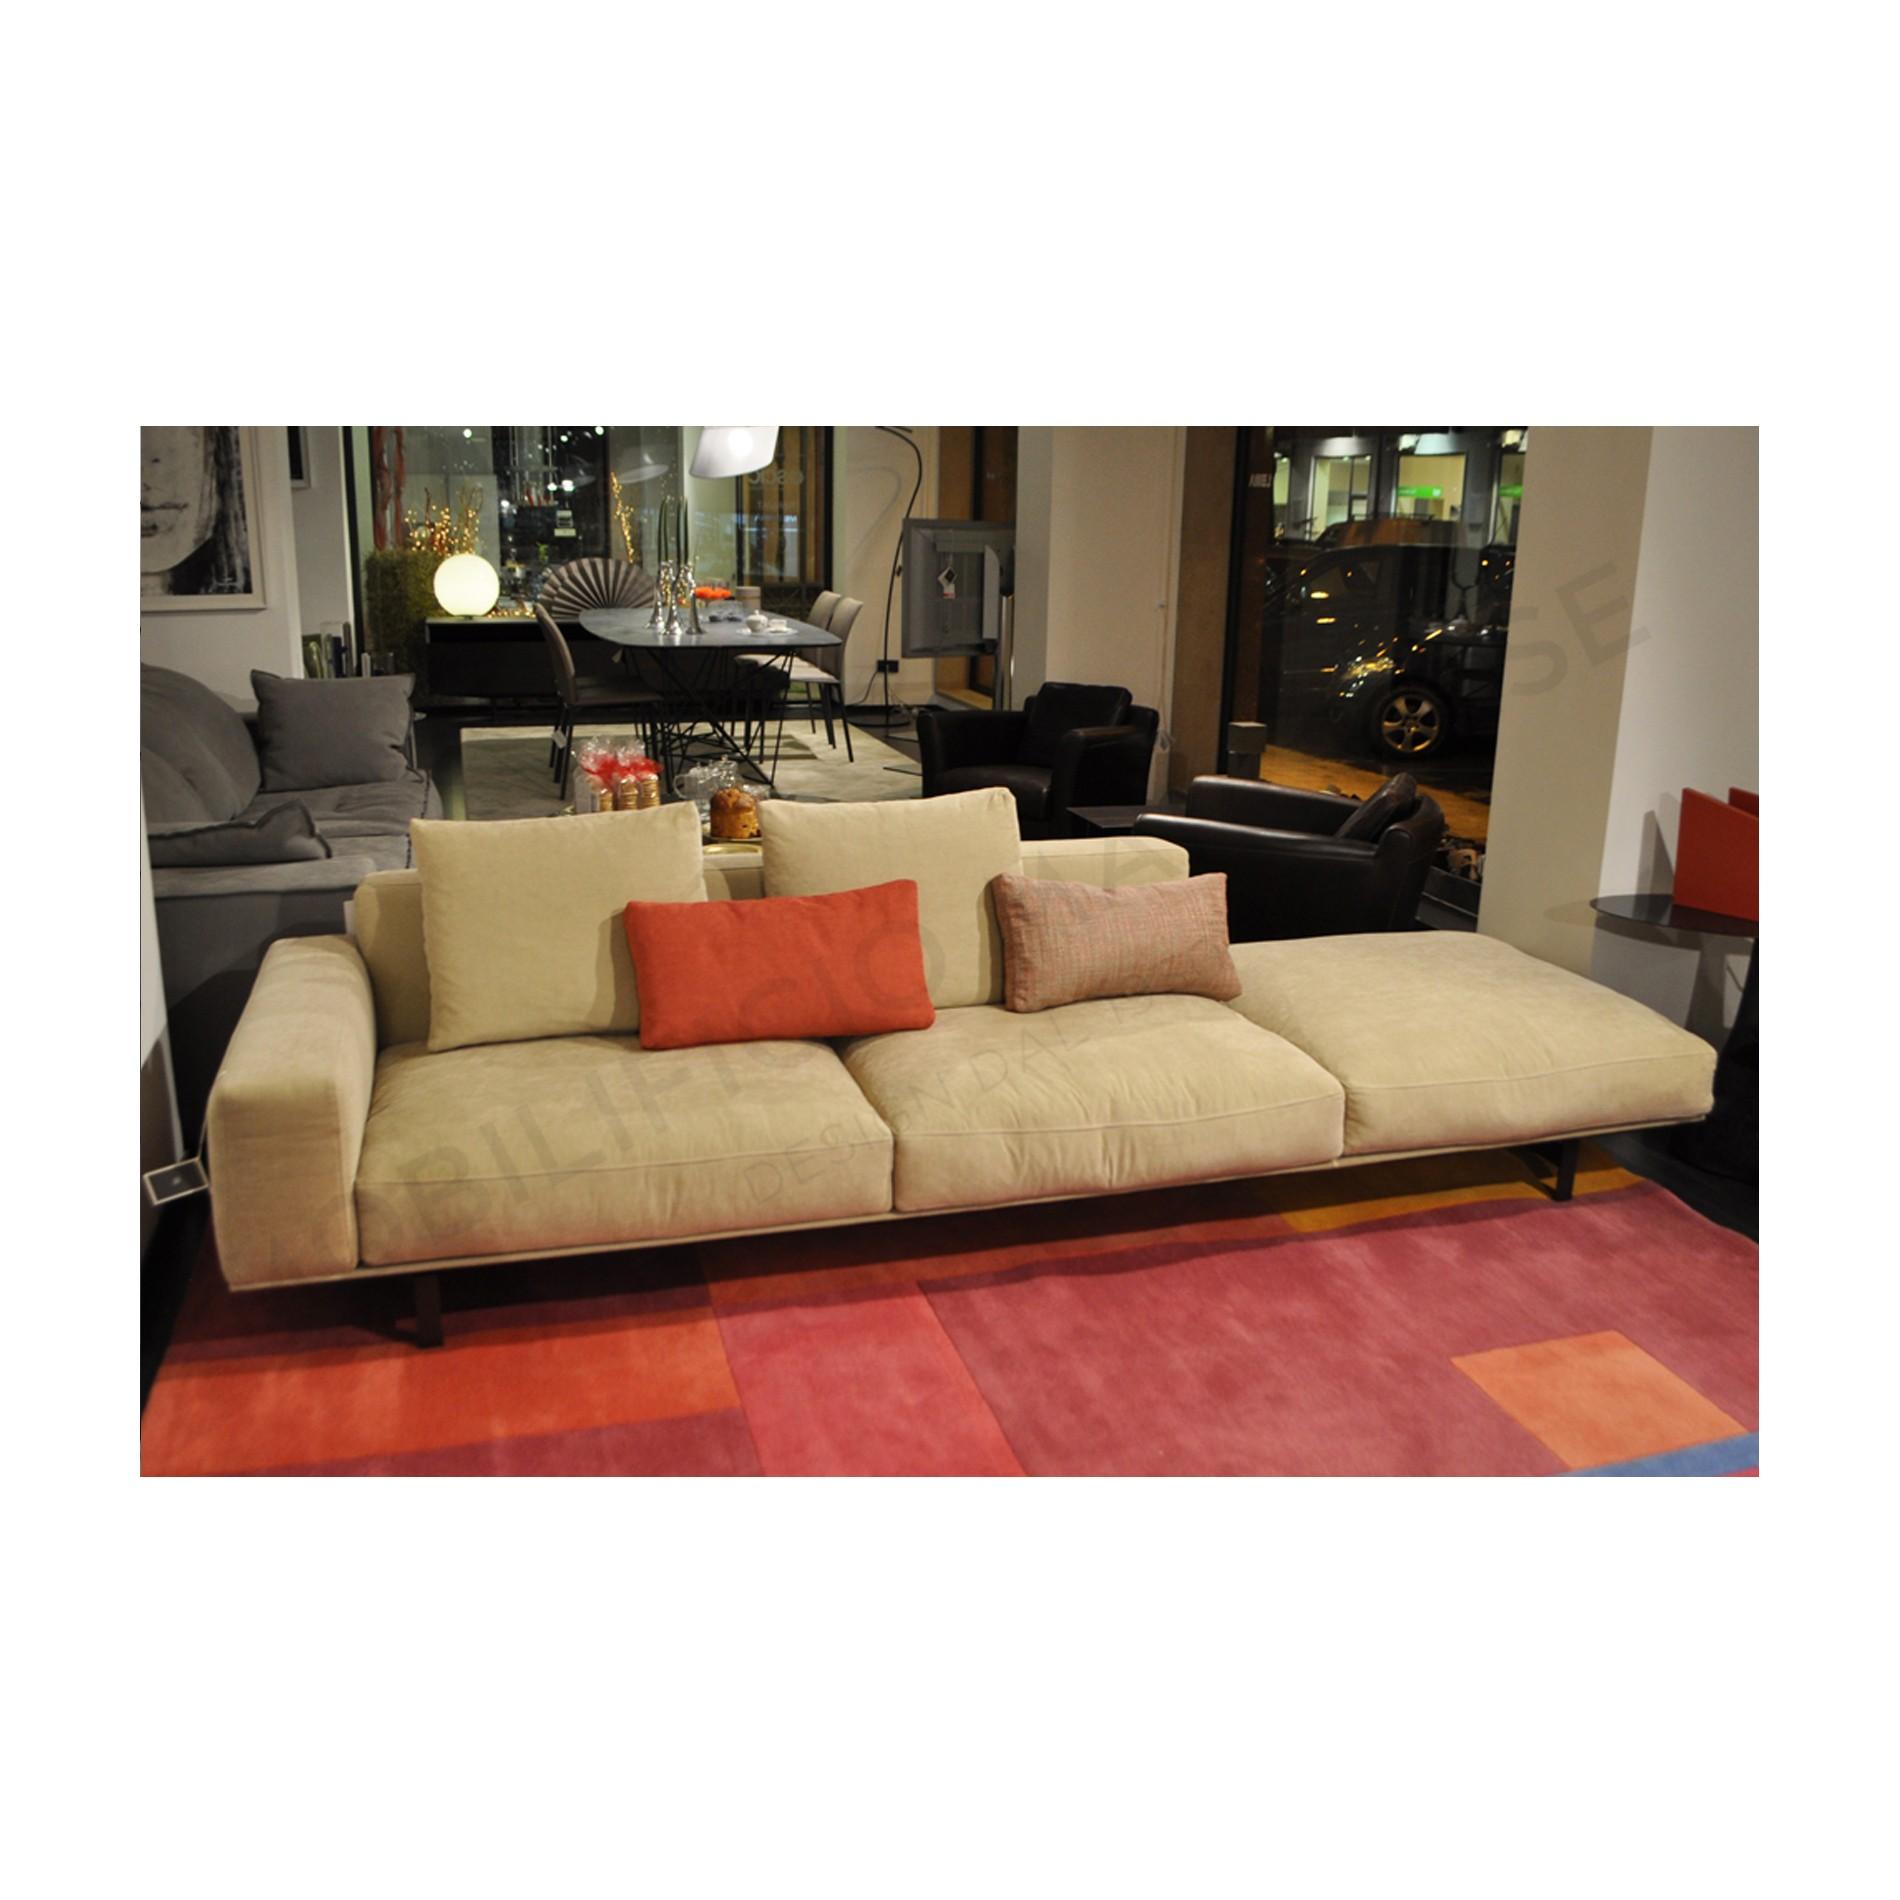 Yard sofa by Lema Mobilificio Marchese